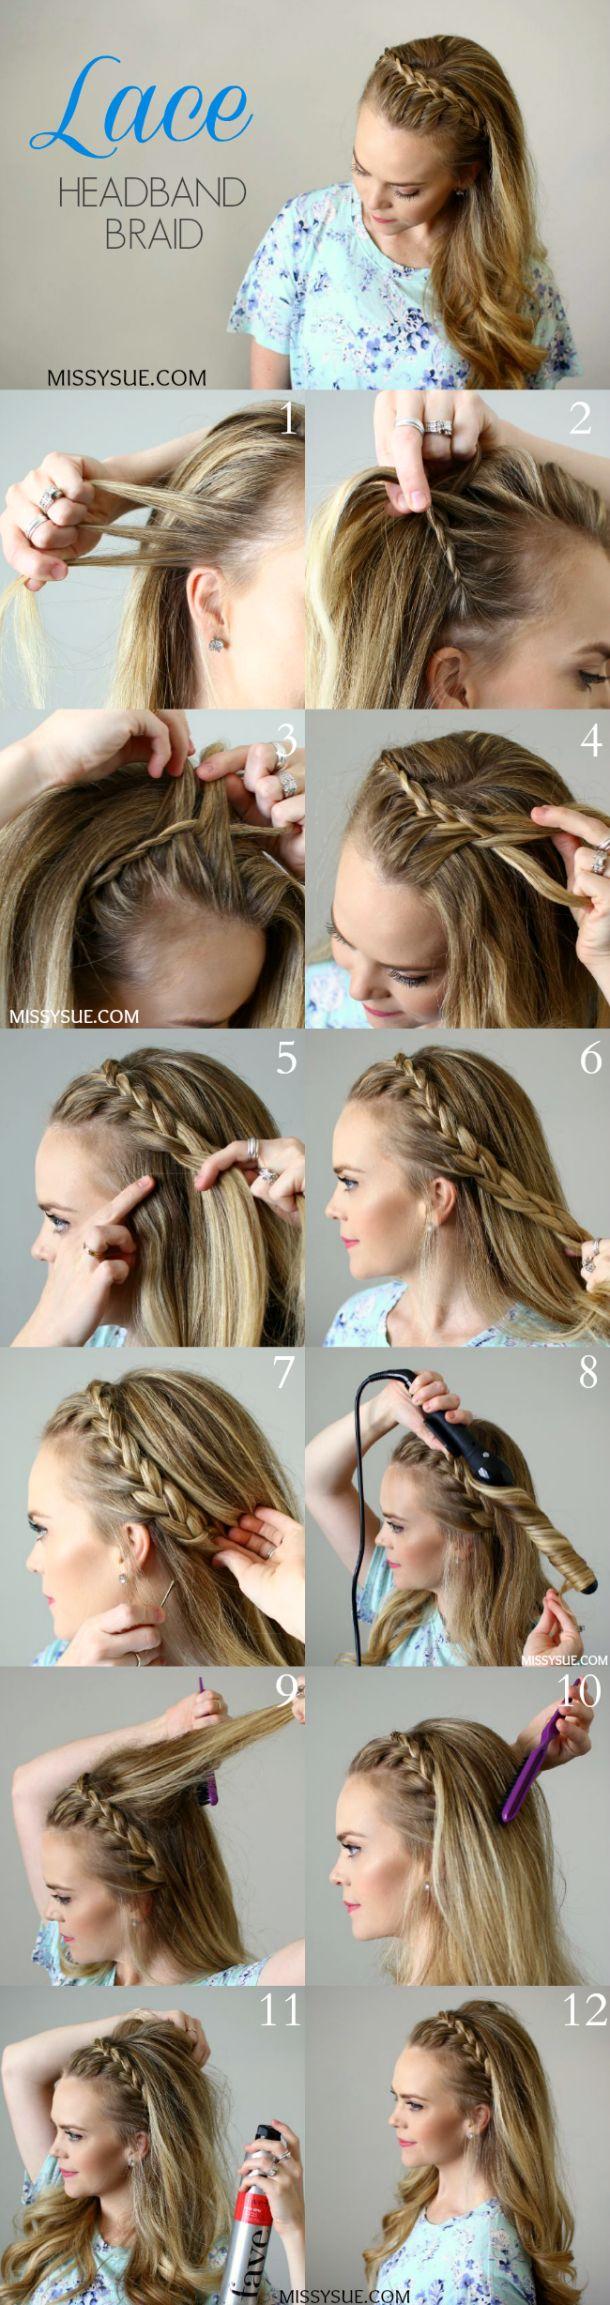 Lace Headband Braid